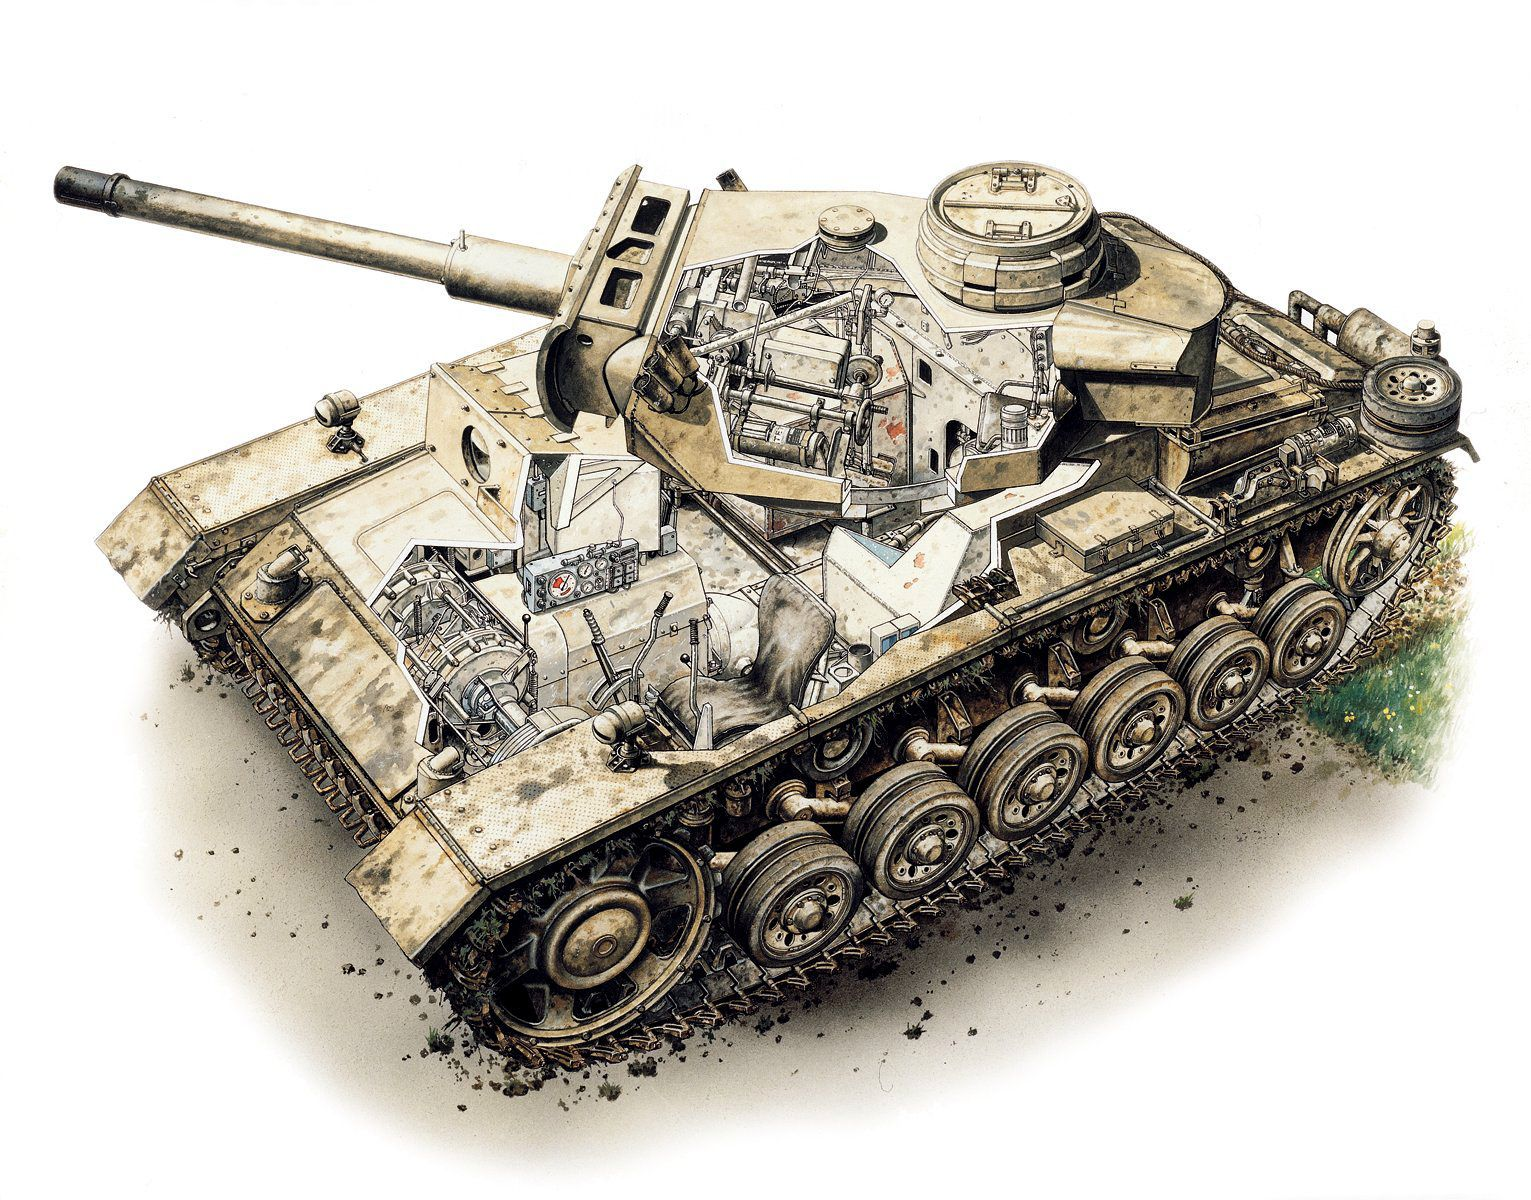 Flammpanzer III o Panzerkampfwagen III (FI) (Sd.Kfz. 142/3); Italia, 1943. Peter Sarson. http://www.elgrancapitan.org/foro/viewtopic.php?f=12&t=17519&p=909170#p909143